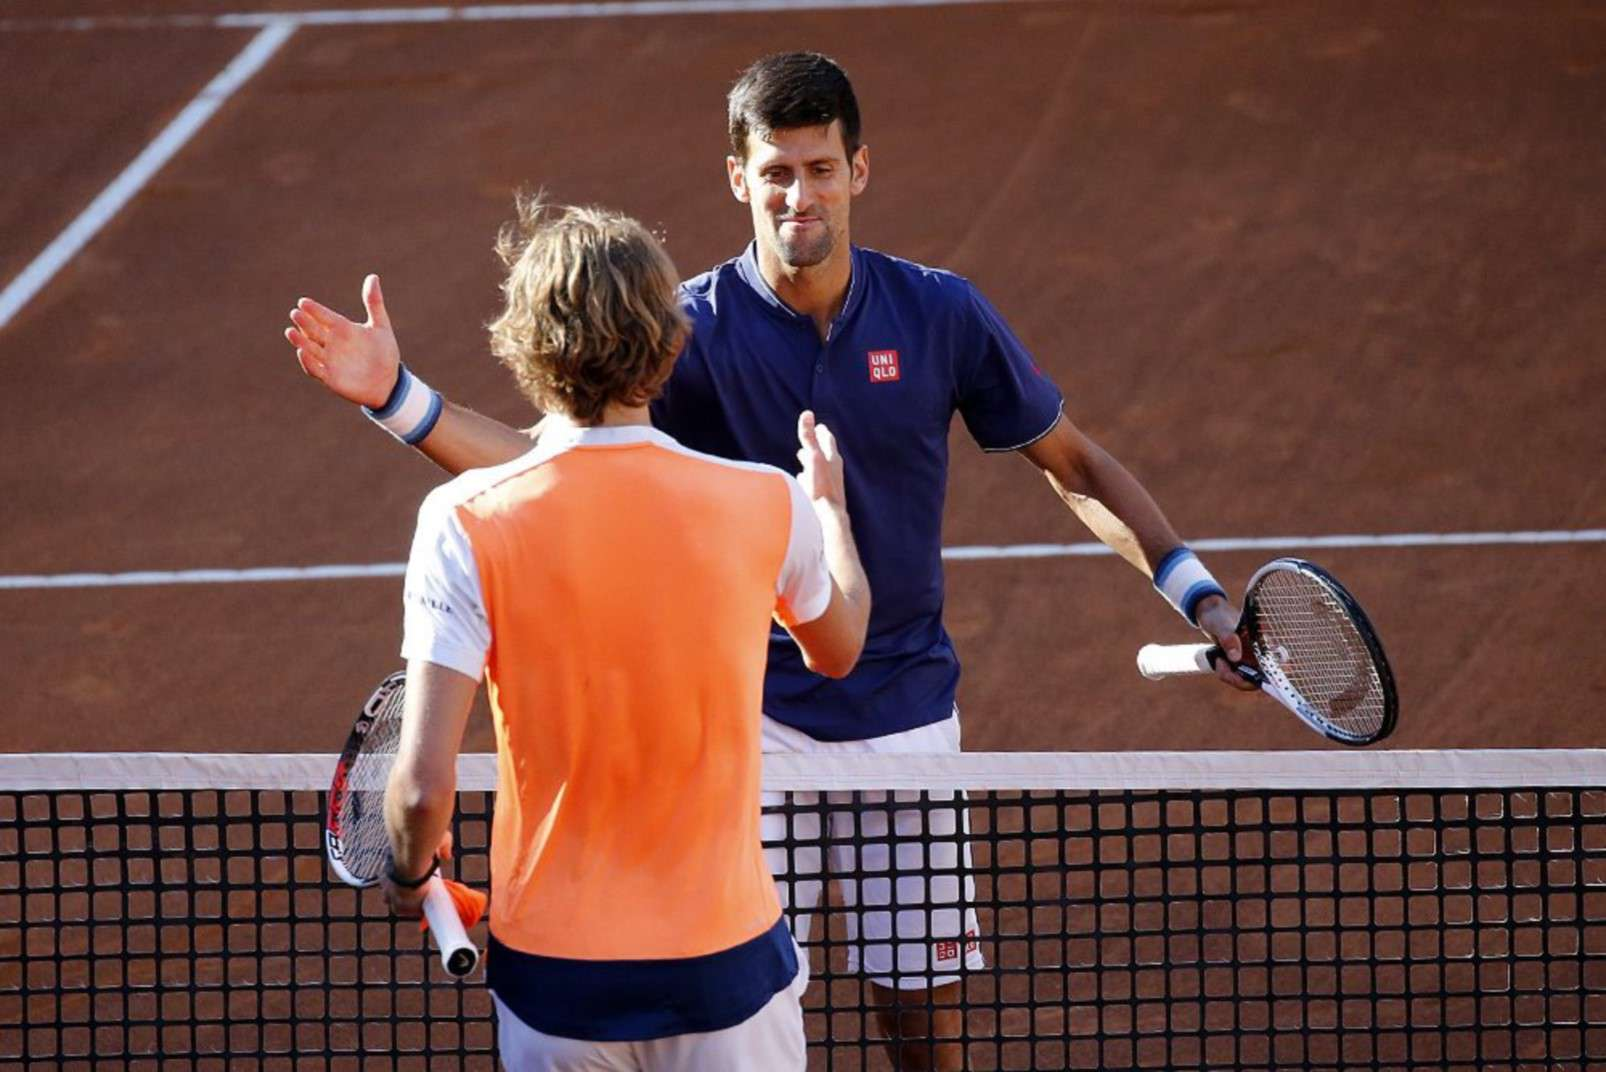 Novak Djokovic e Alexander Zverev, finali 2017, foto di Giampiero Sposito, gentilmente fornita da internazionalibnlditalia.com